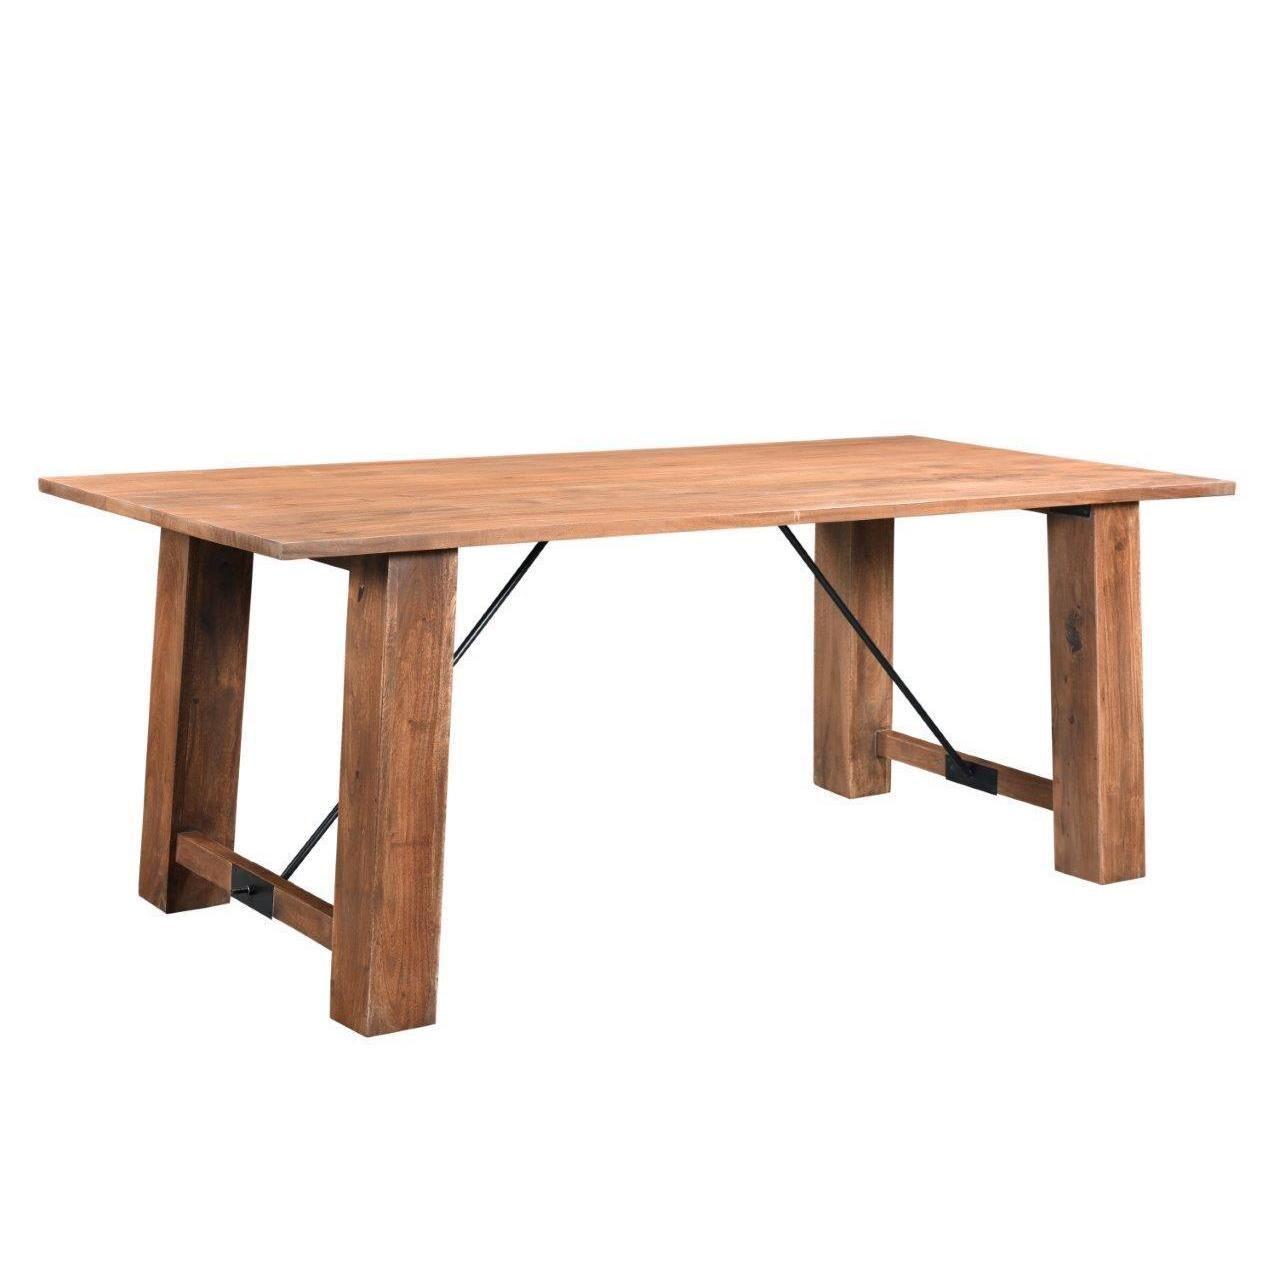 Super Handmade Timbergirl Angled Acacia Wood Dining Table India Lamtechconsult Wood Chair Design Ideas Lamtechconsultcom